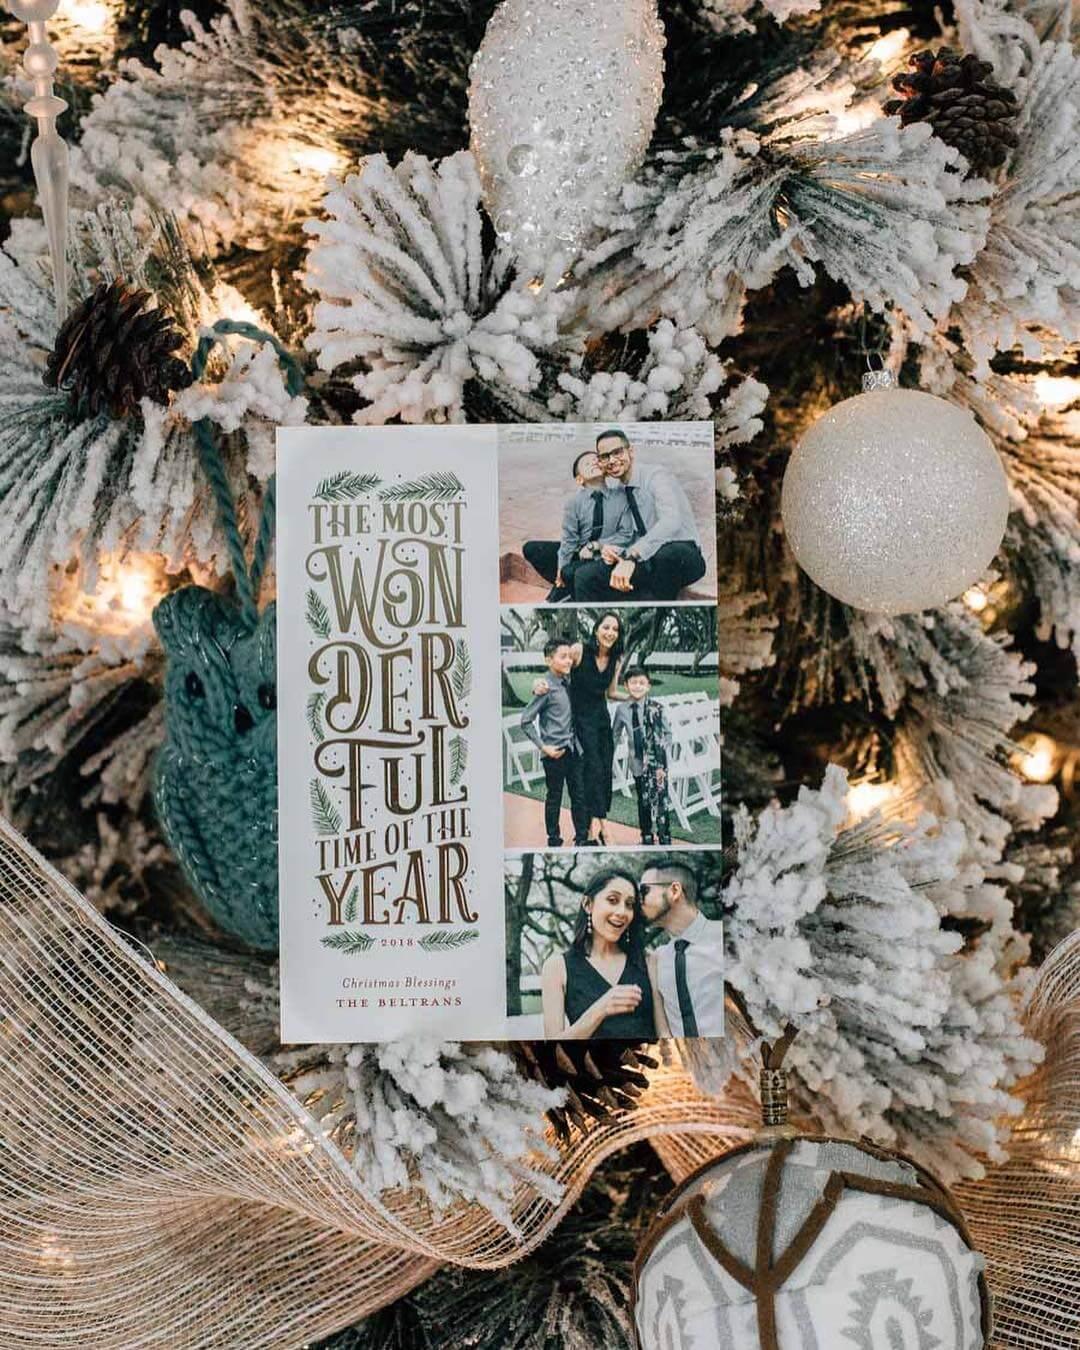 Glittery card on white tree